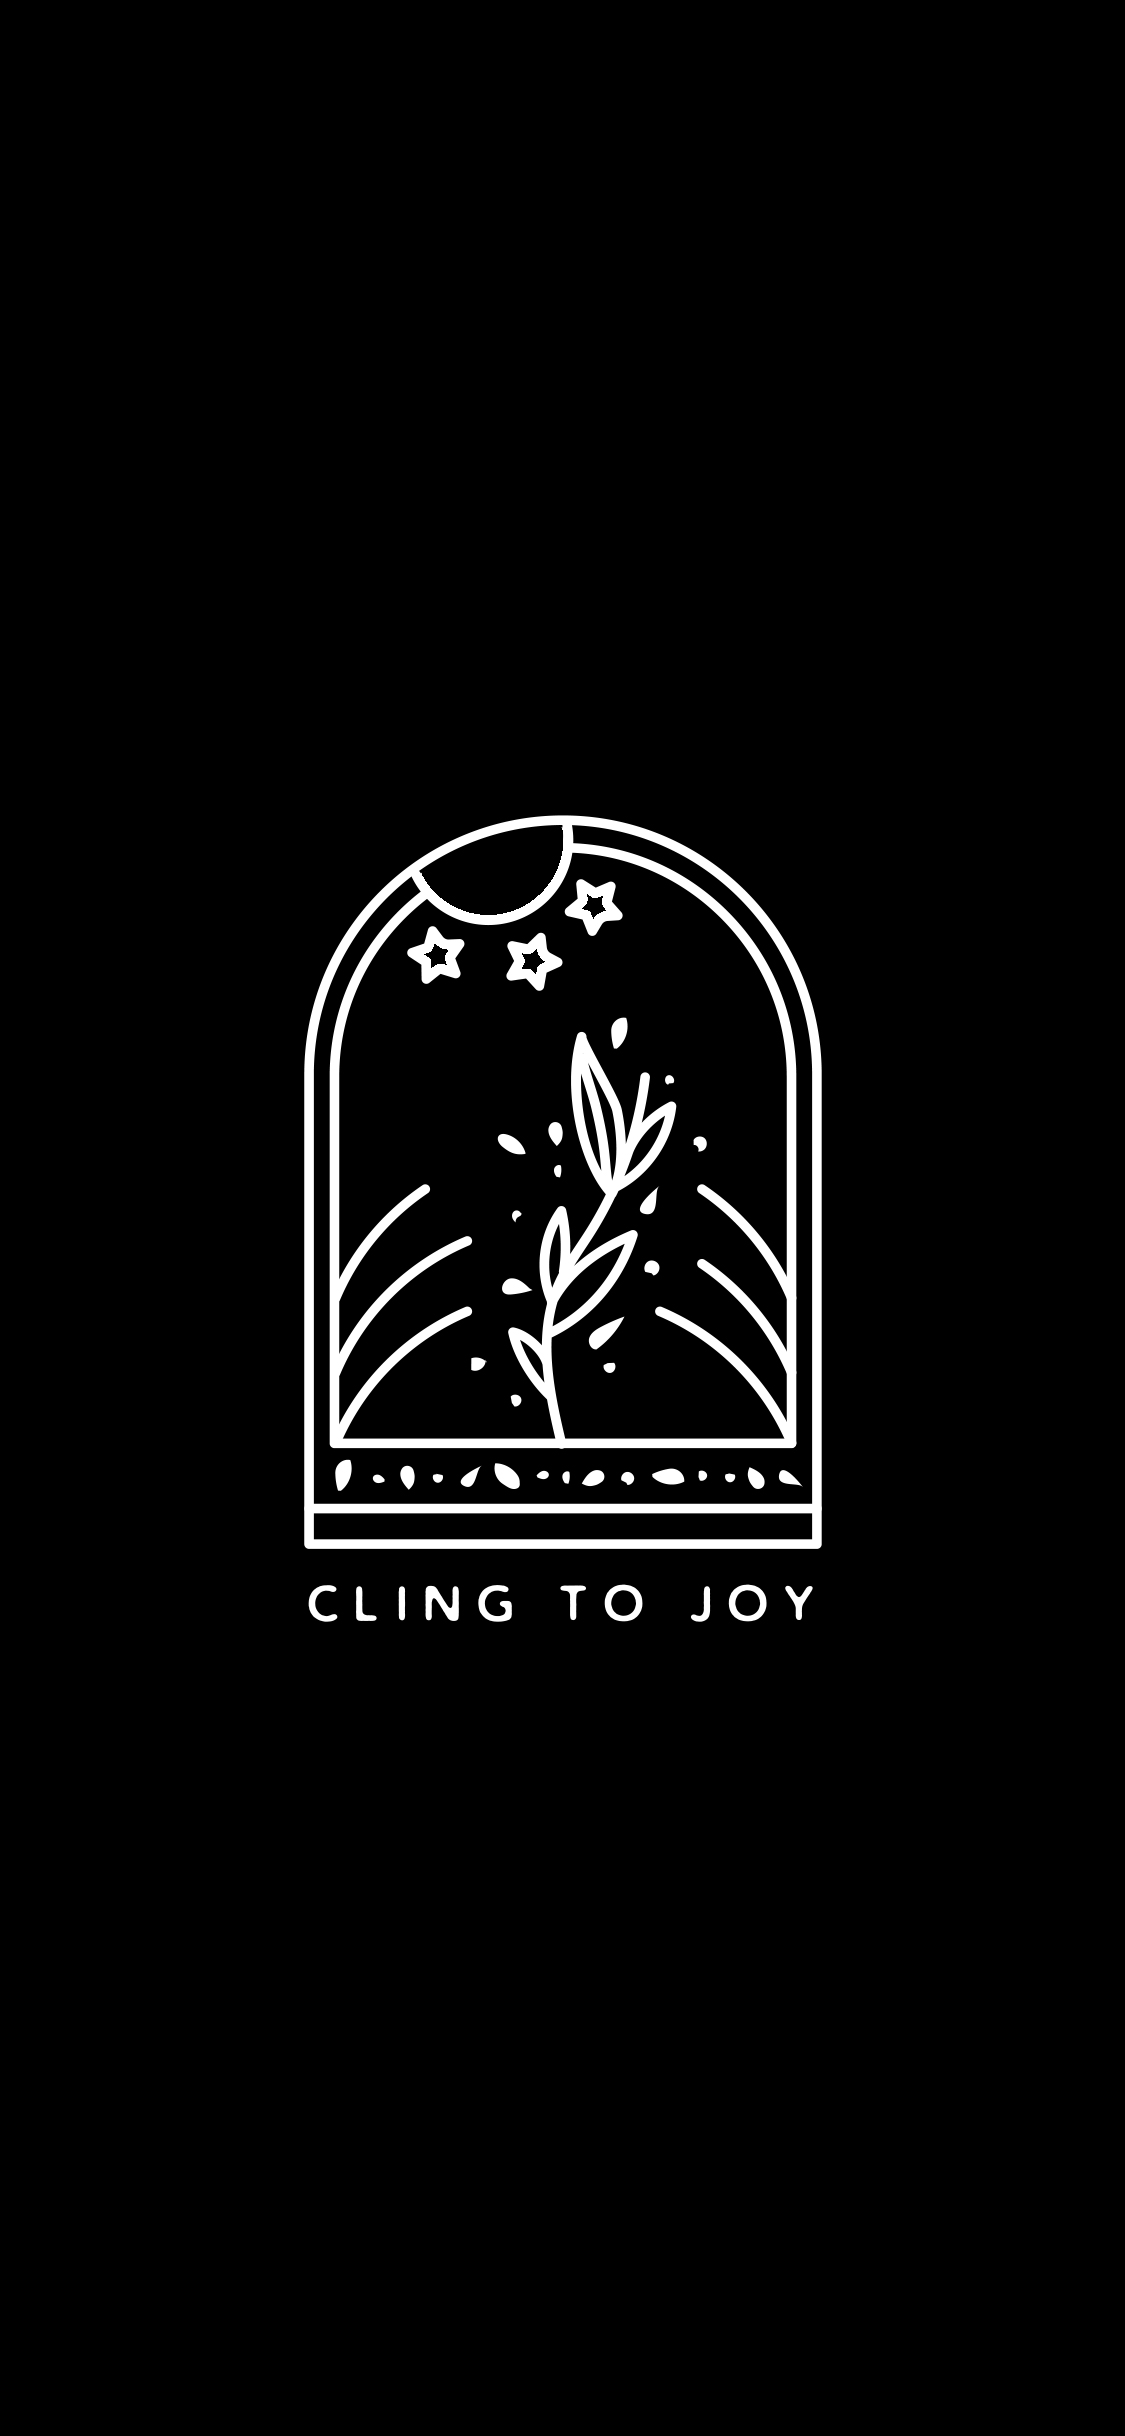 Download Cling to Joy wallpaper